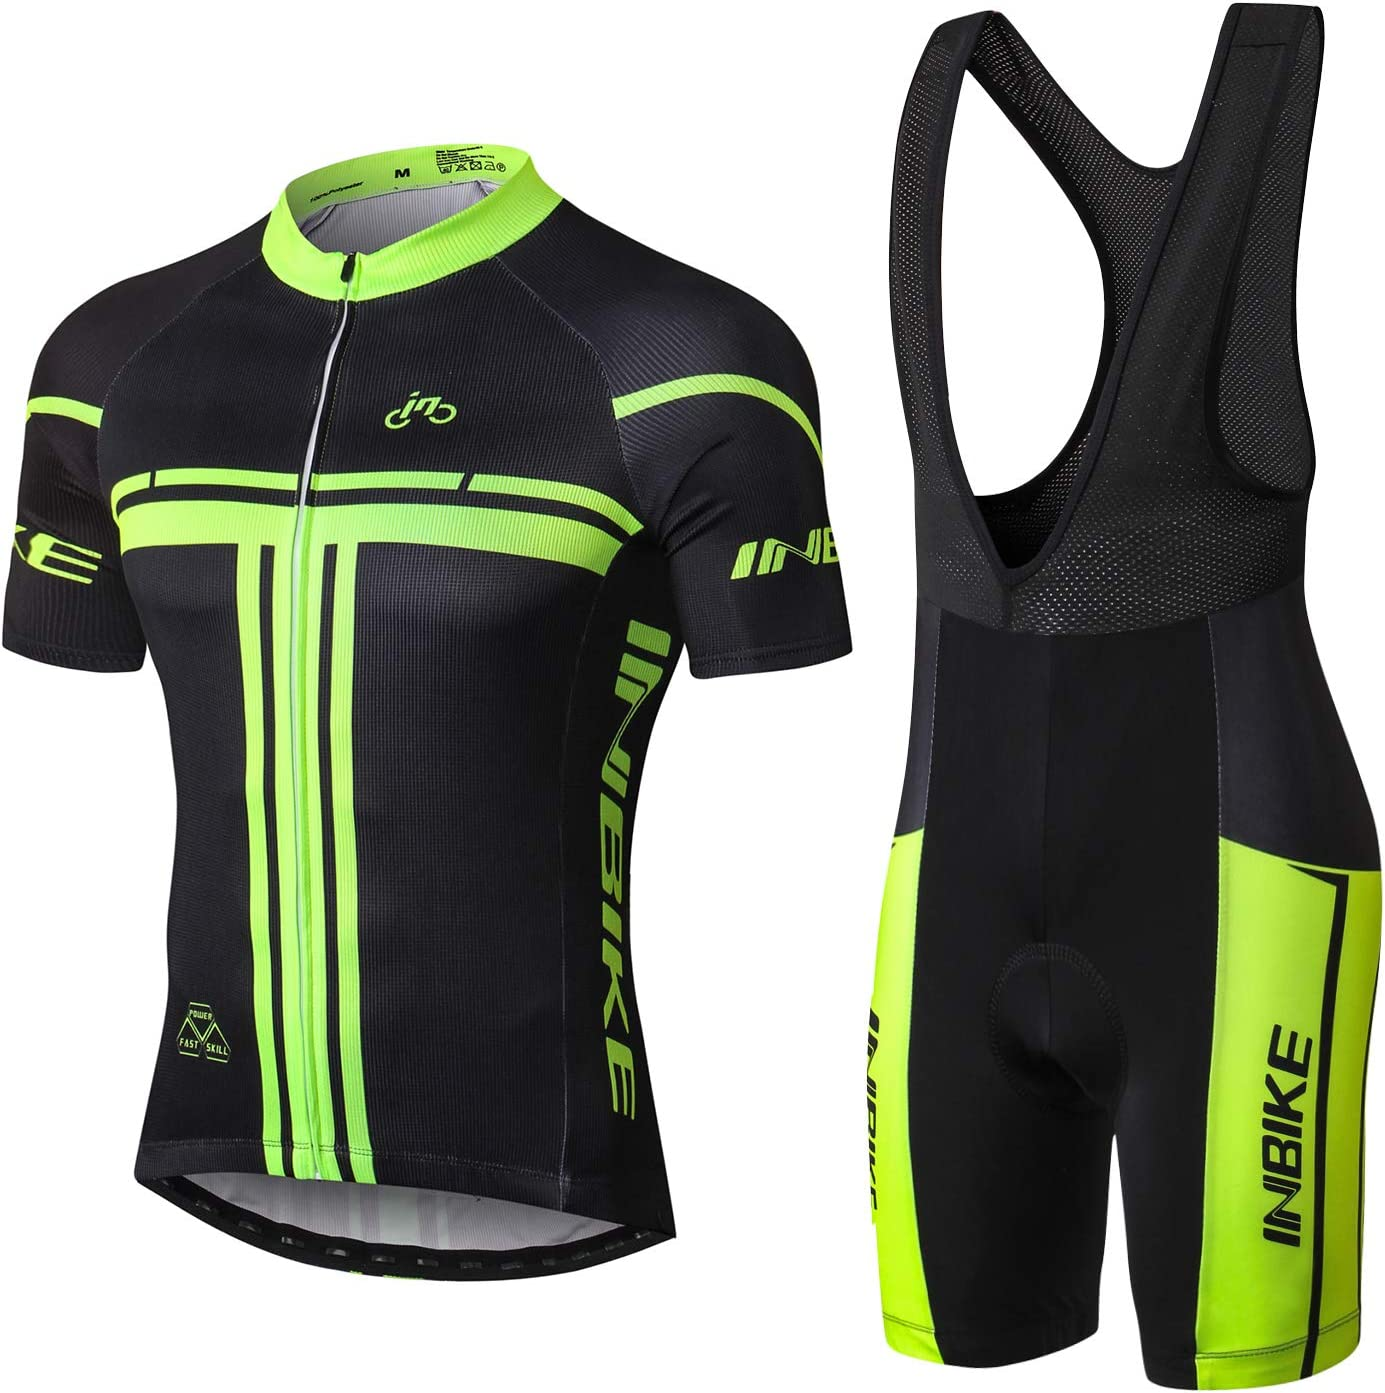 INBIKE Conjunto Ropa Equipacion Traje Ciclismo Hombre para Verano, Maillot Ciclismo Hombre+Culotte Ciclismo Culote Bicicleta